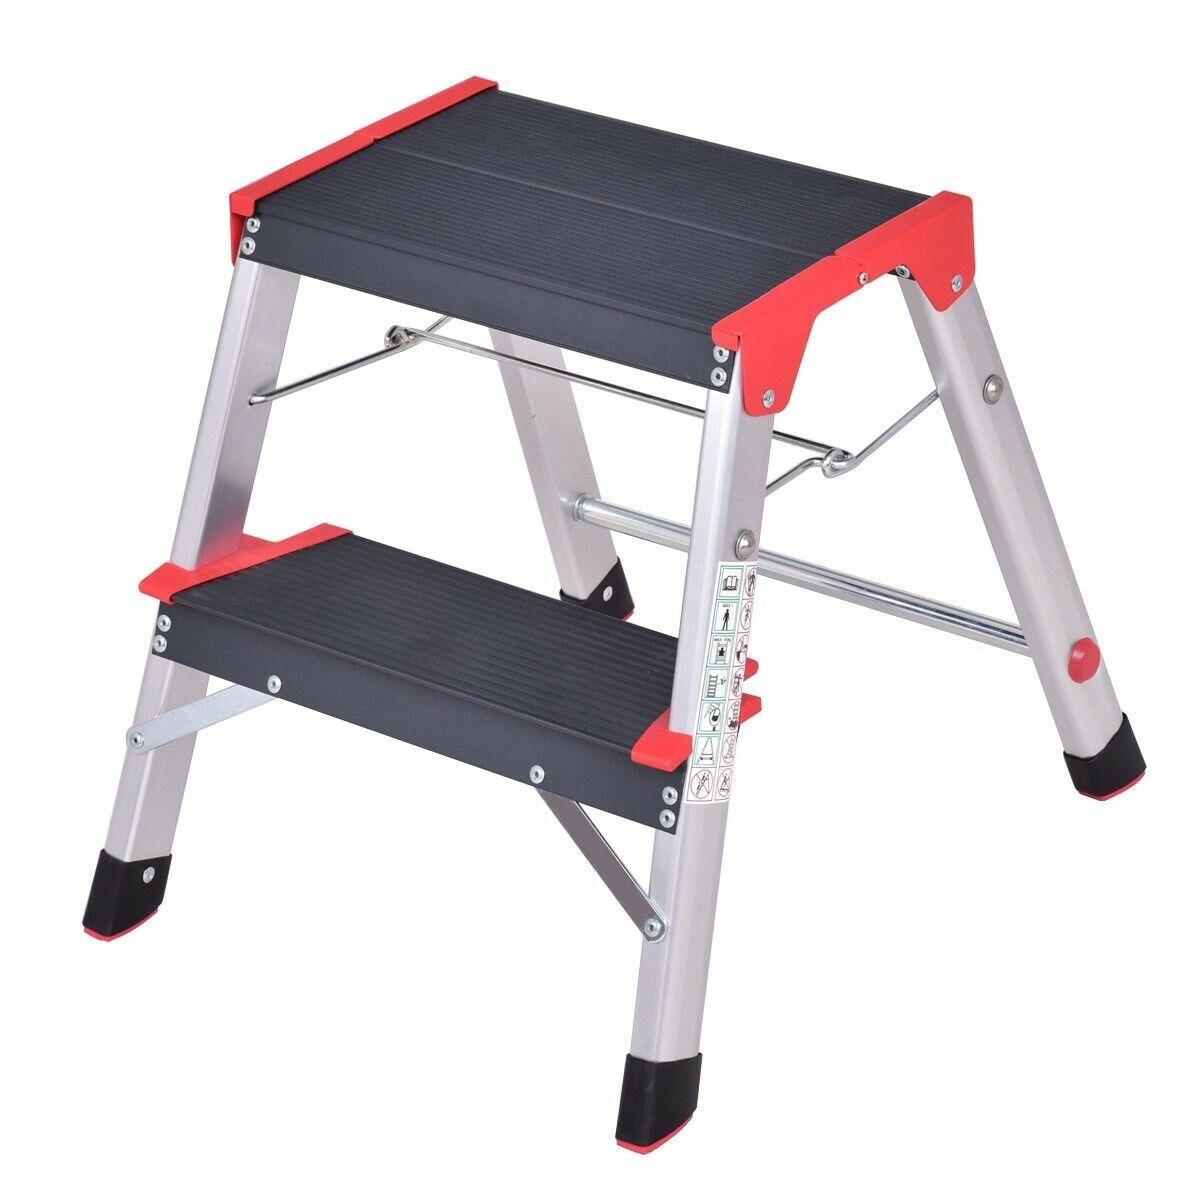 Step Stool Ladder Heavy Duty 2-Step Aluminum Scaffolding Non